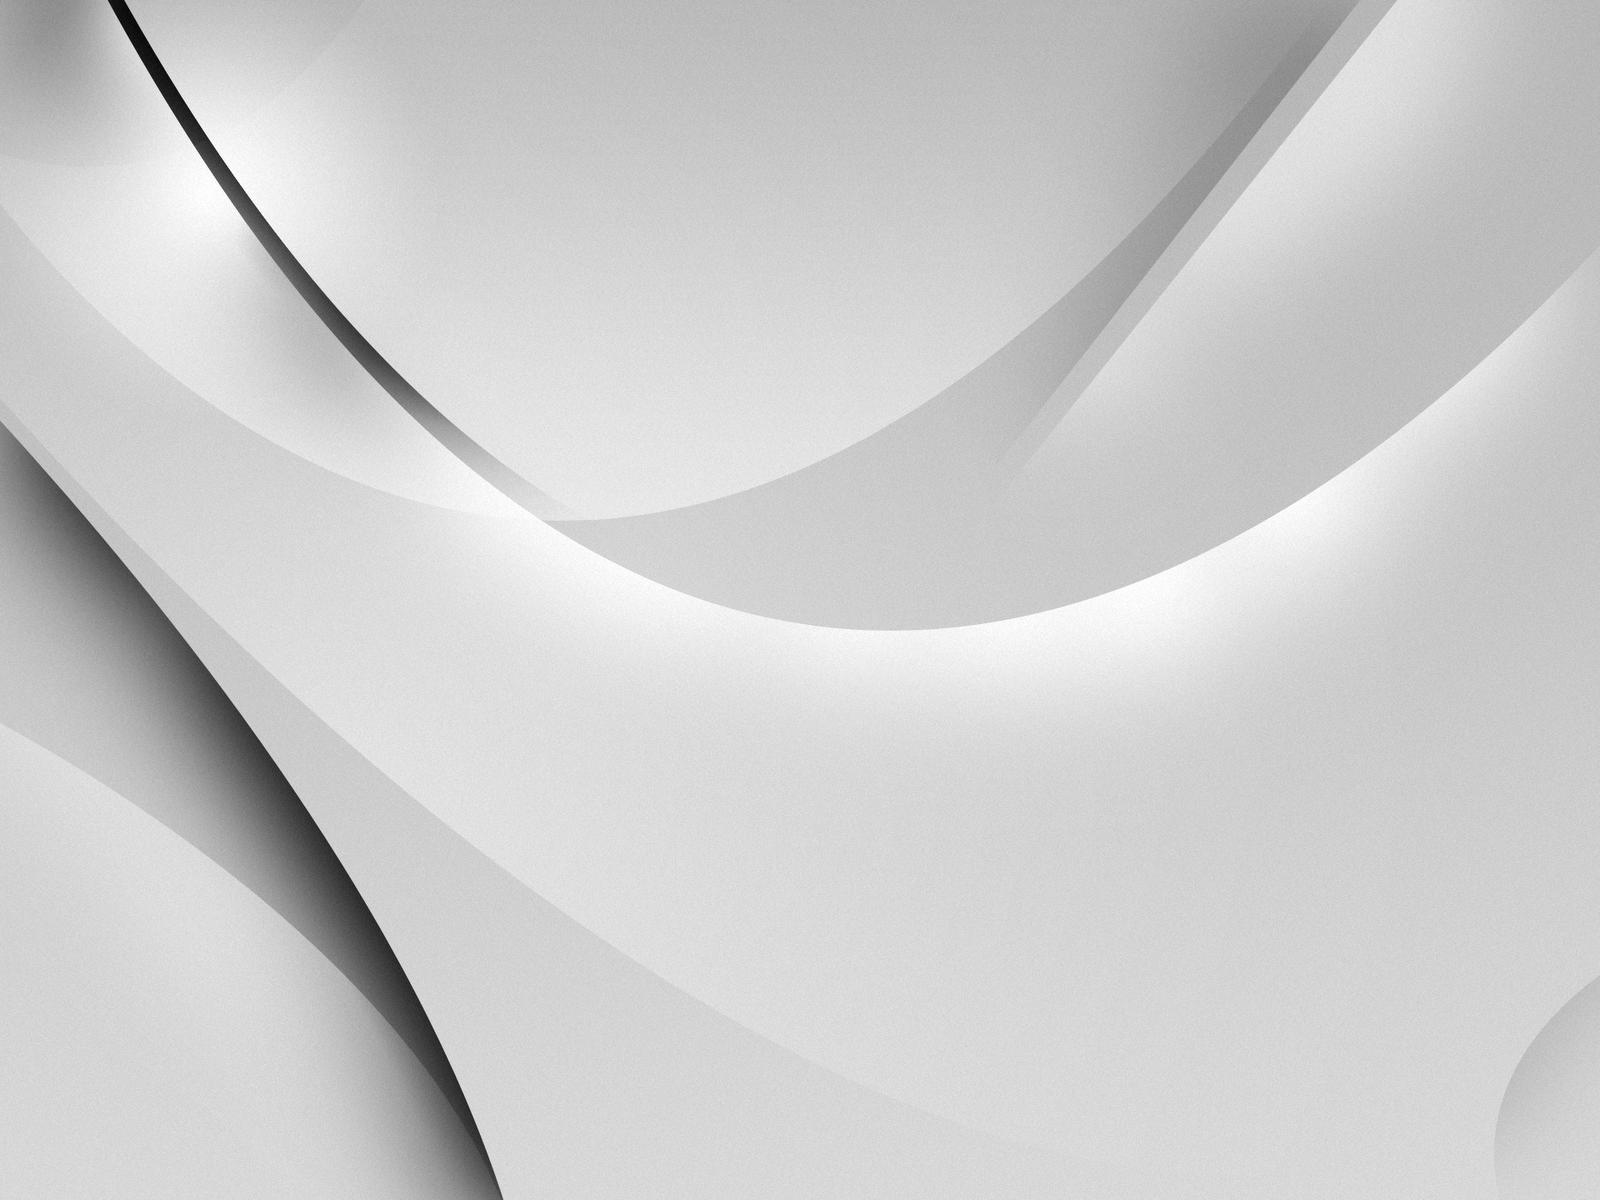 Balck And White Wallpaper: Black Gray And White Wallpaper